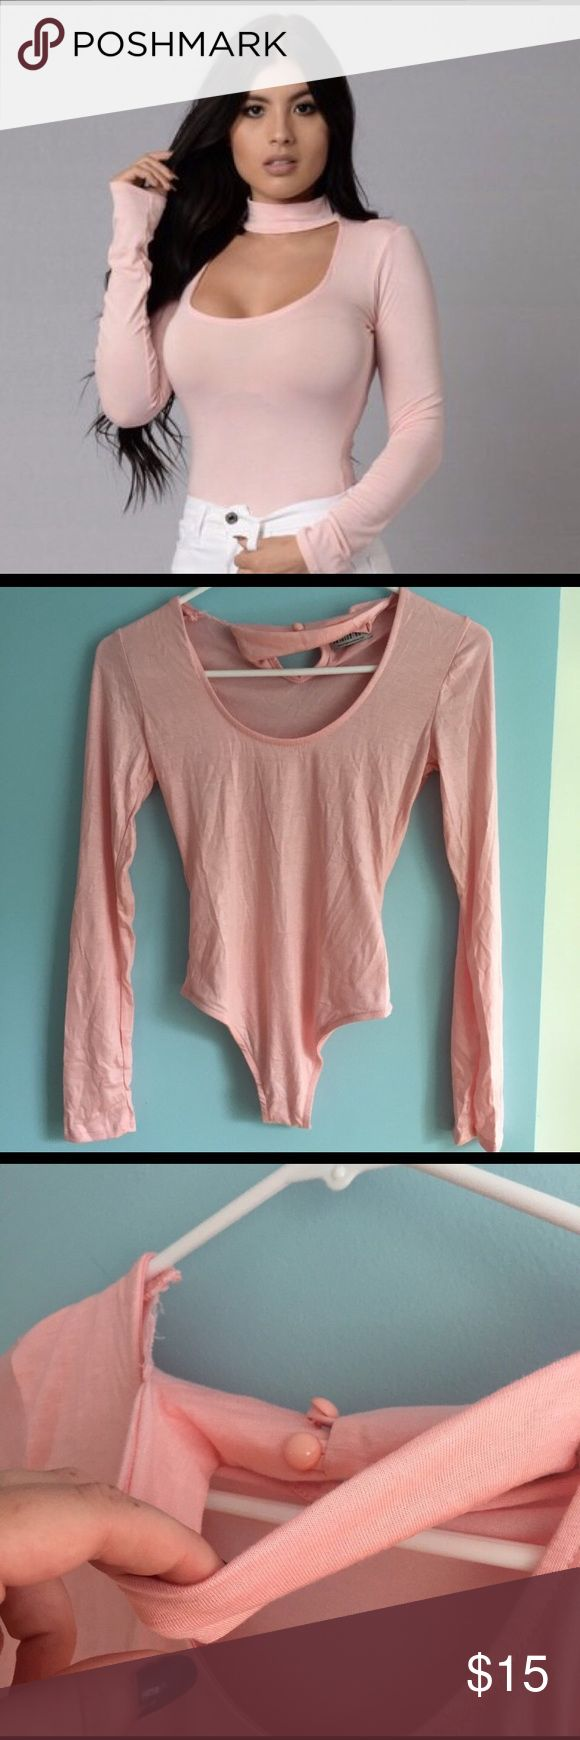 NEW spandex body suit in baby pink BRAND NEW, NEVER WORN baby pink long-sleeved spandex bodysuit w/ choker neckline. Fashion Nova Tops